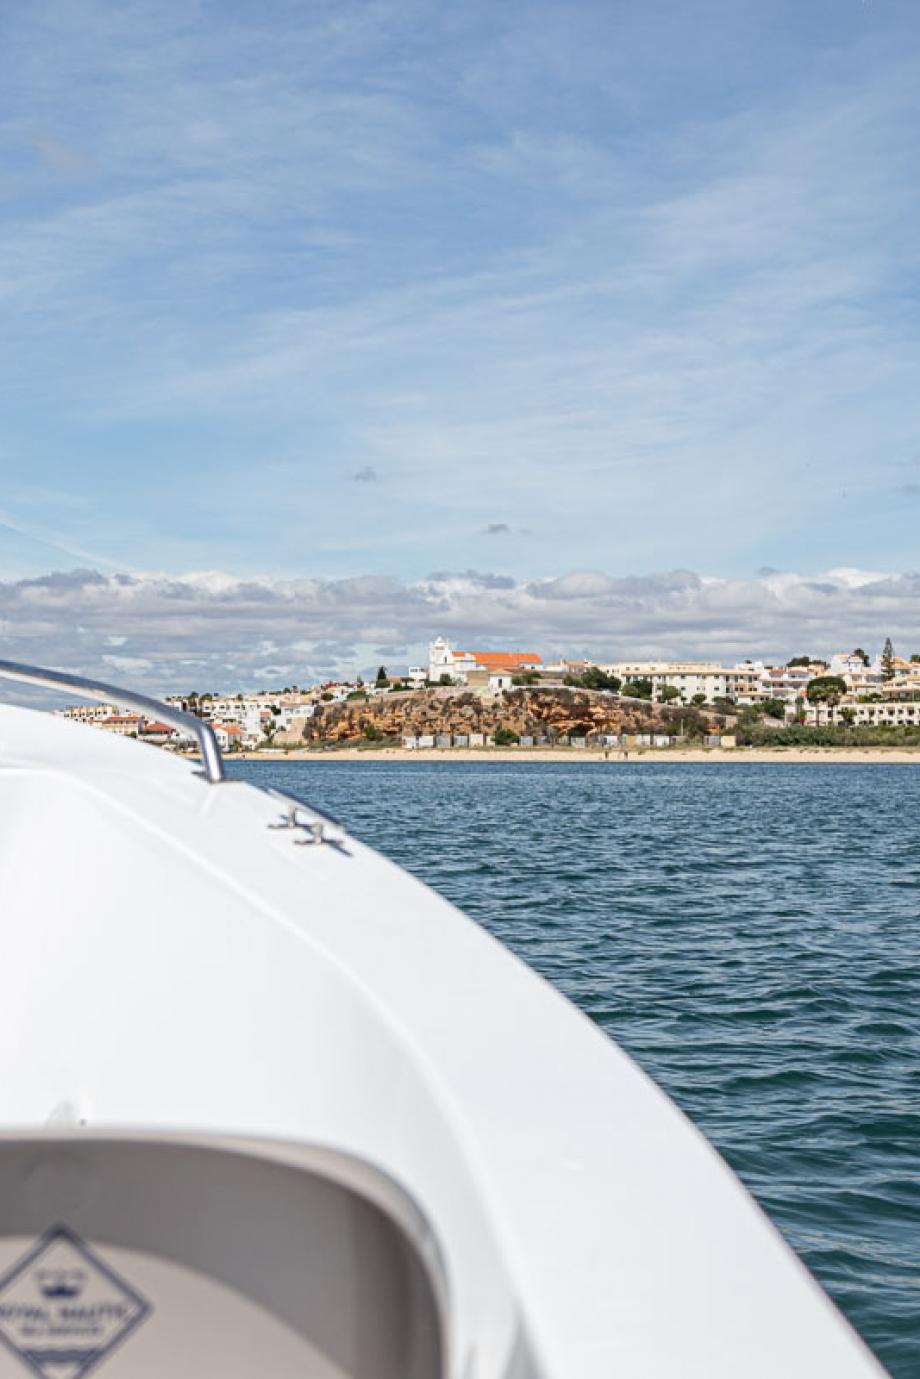 AlgarveCool_Visitar_Royal Nautic